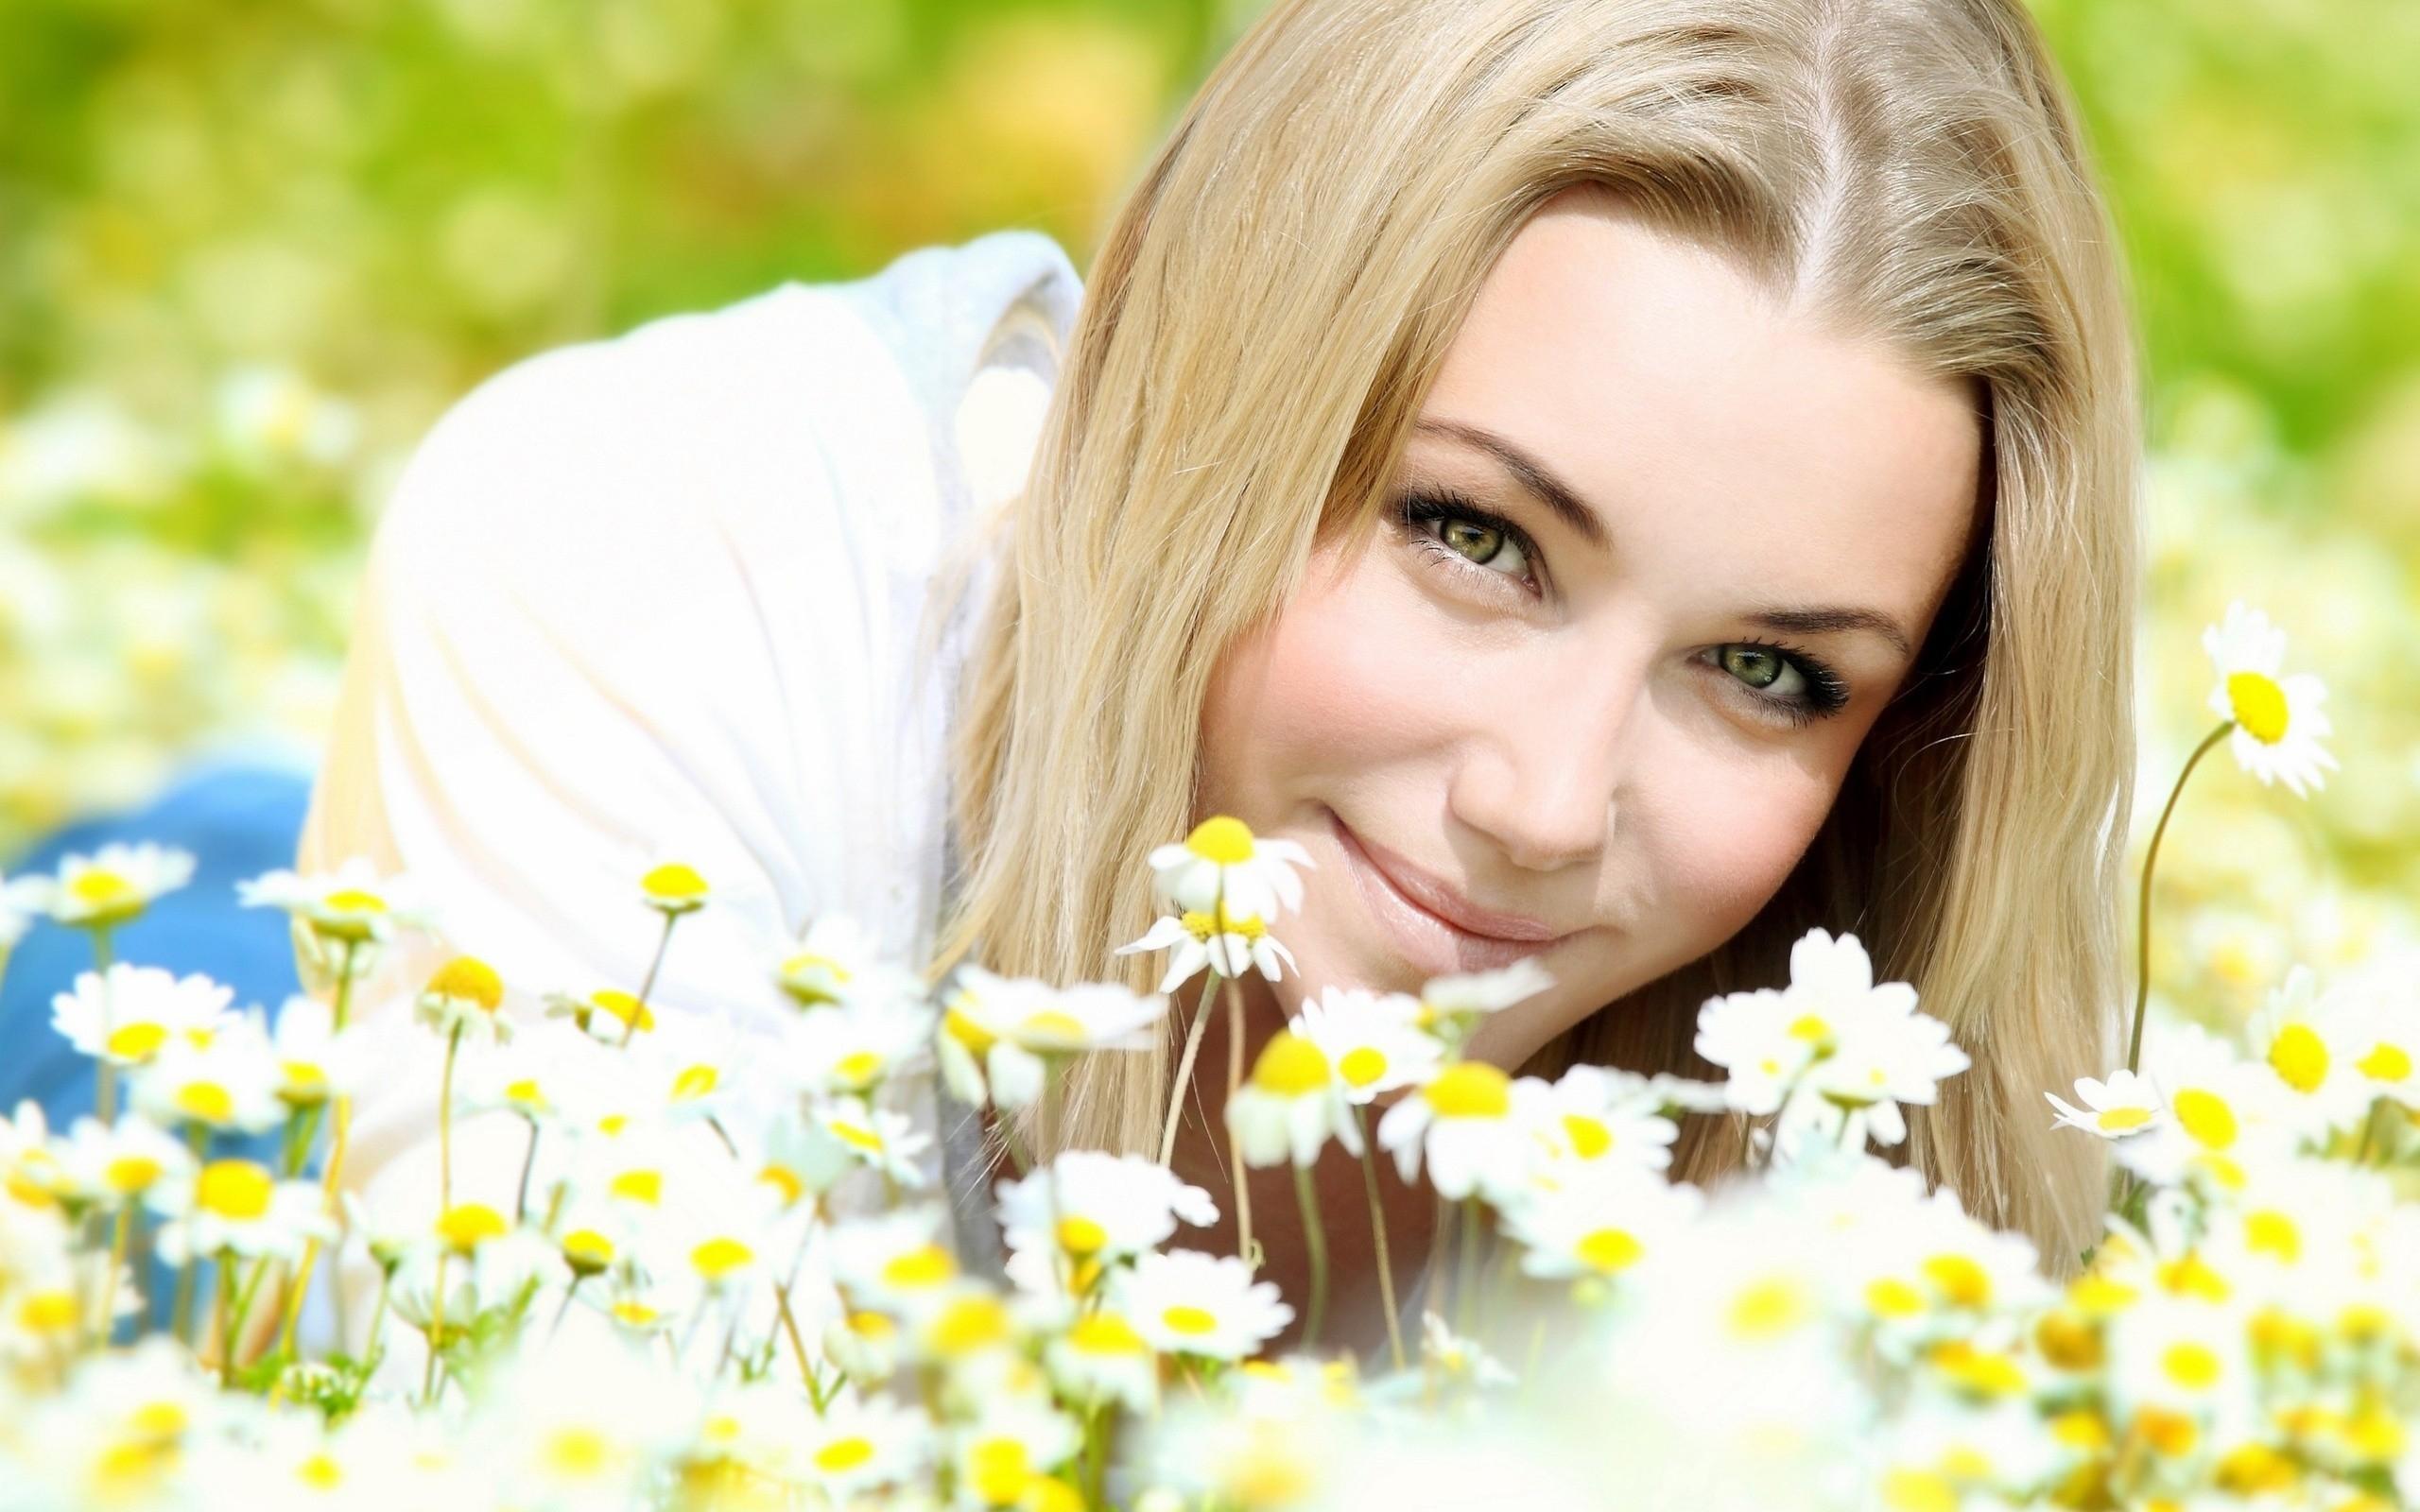 Фото улыбки на фоне природы девушки, знакомства гэнг бэнг во владимире